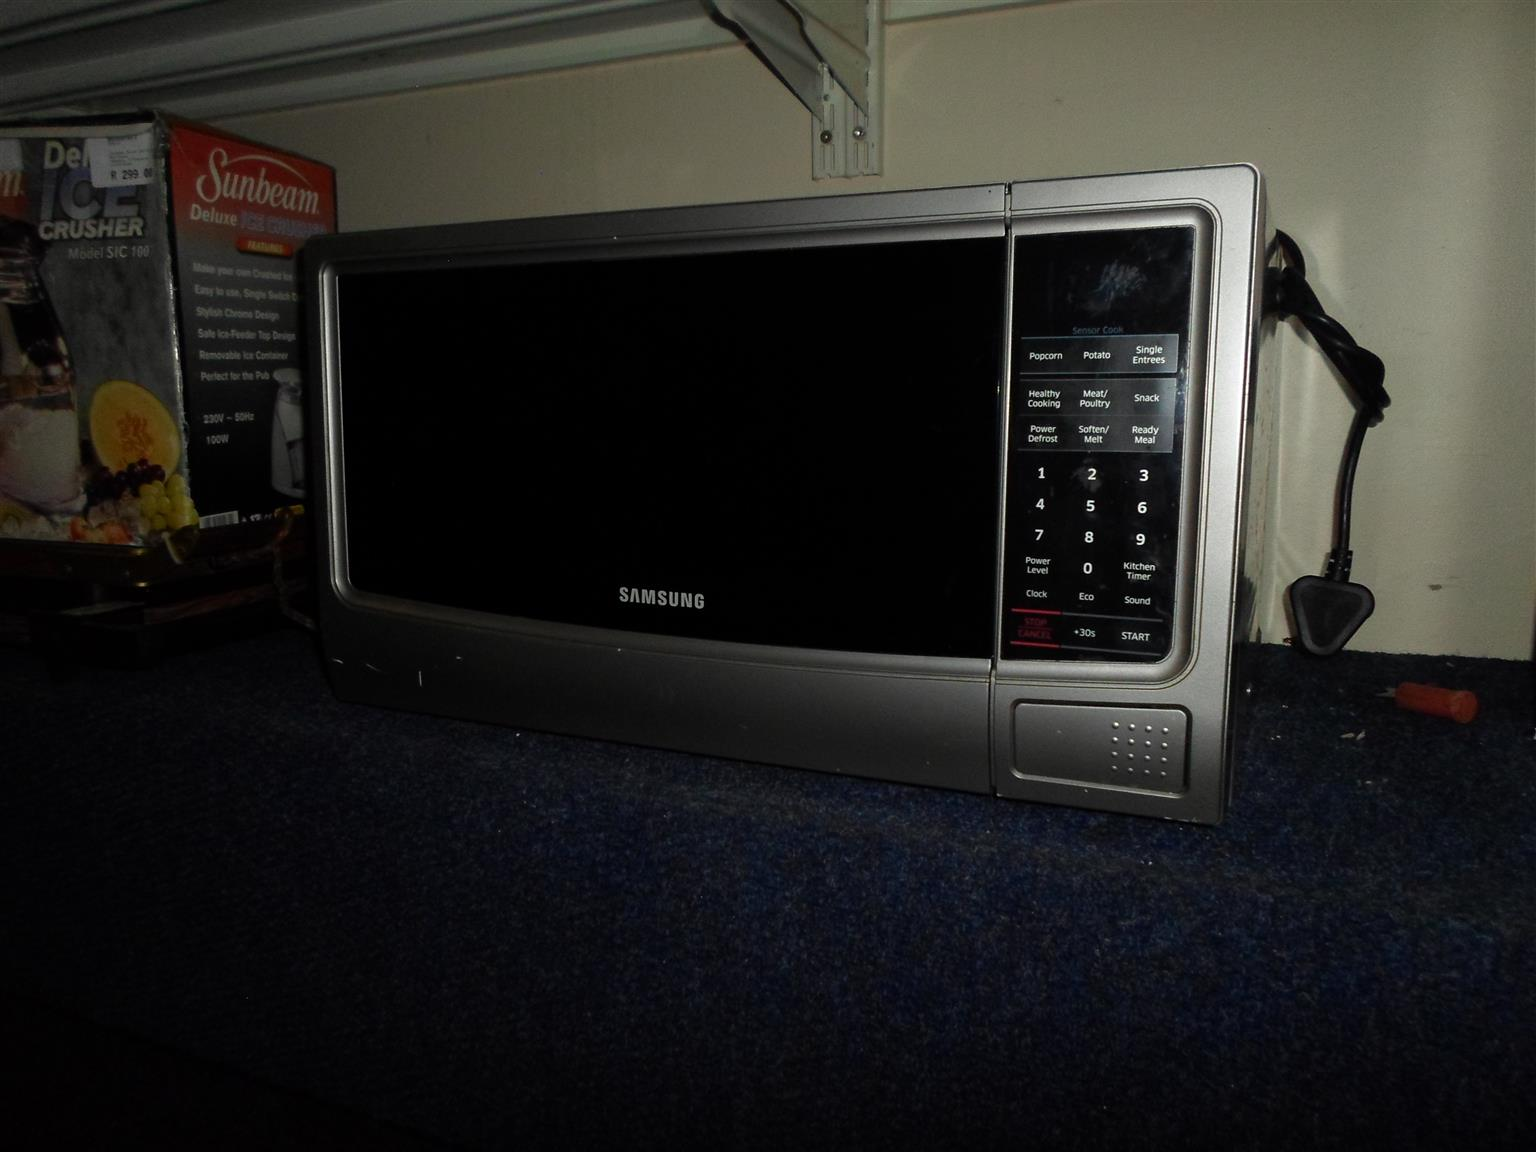 1000W Samsung Microwave